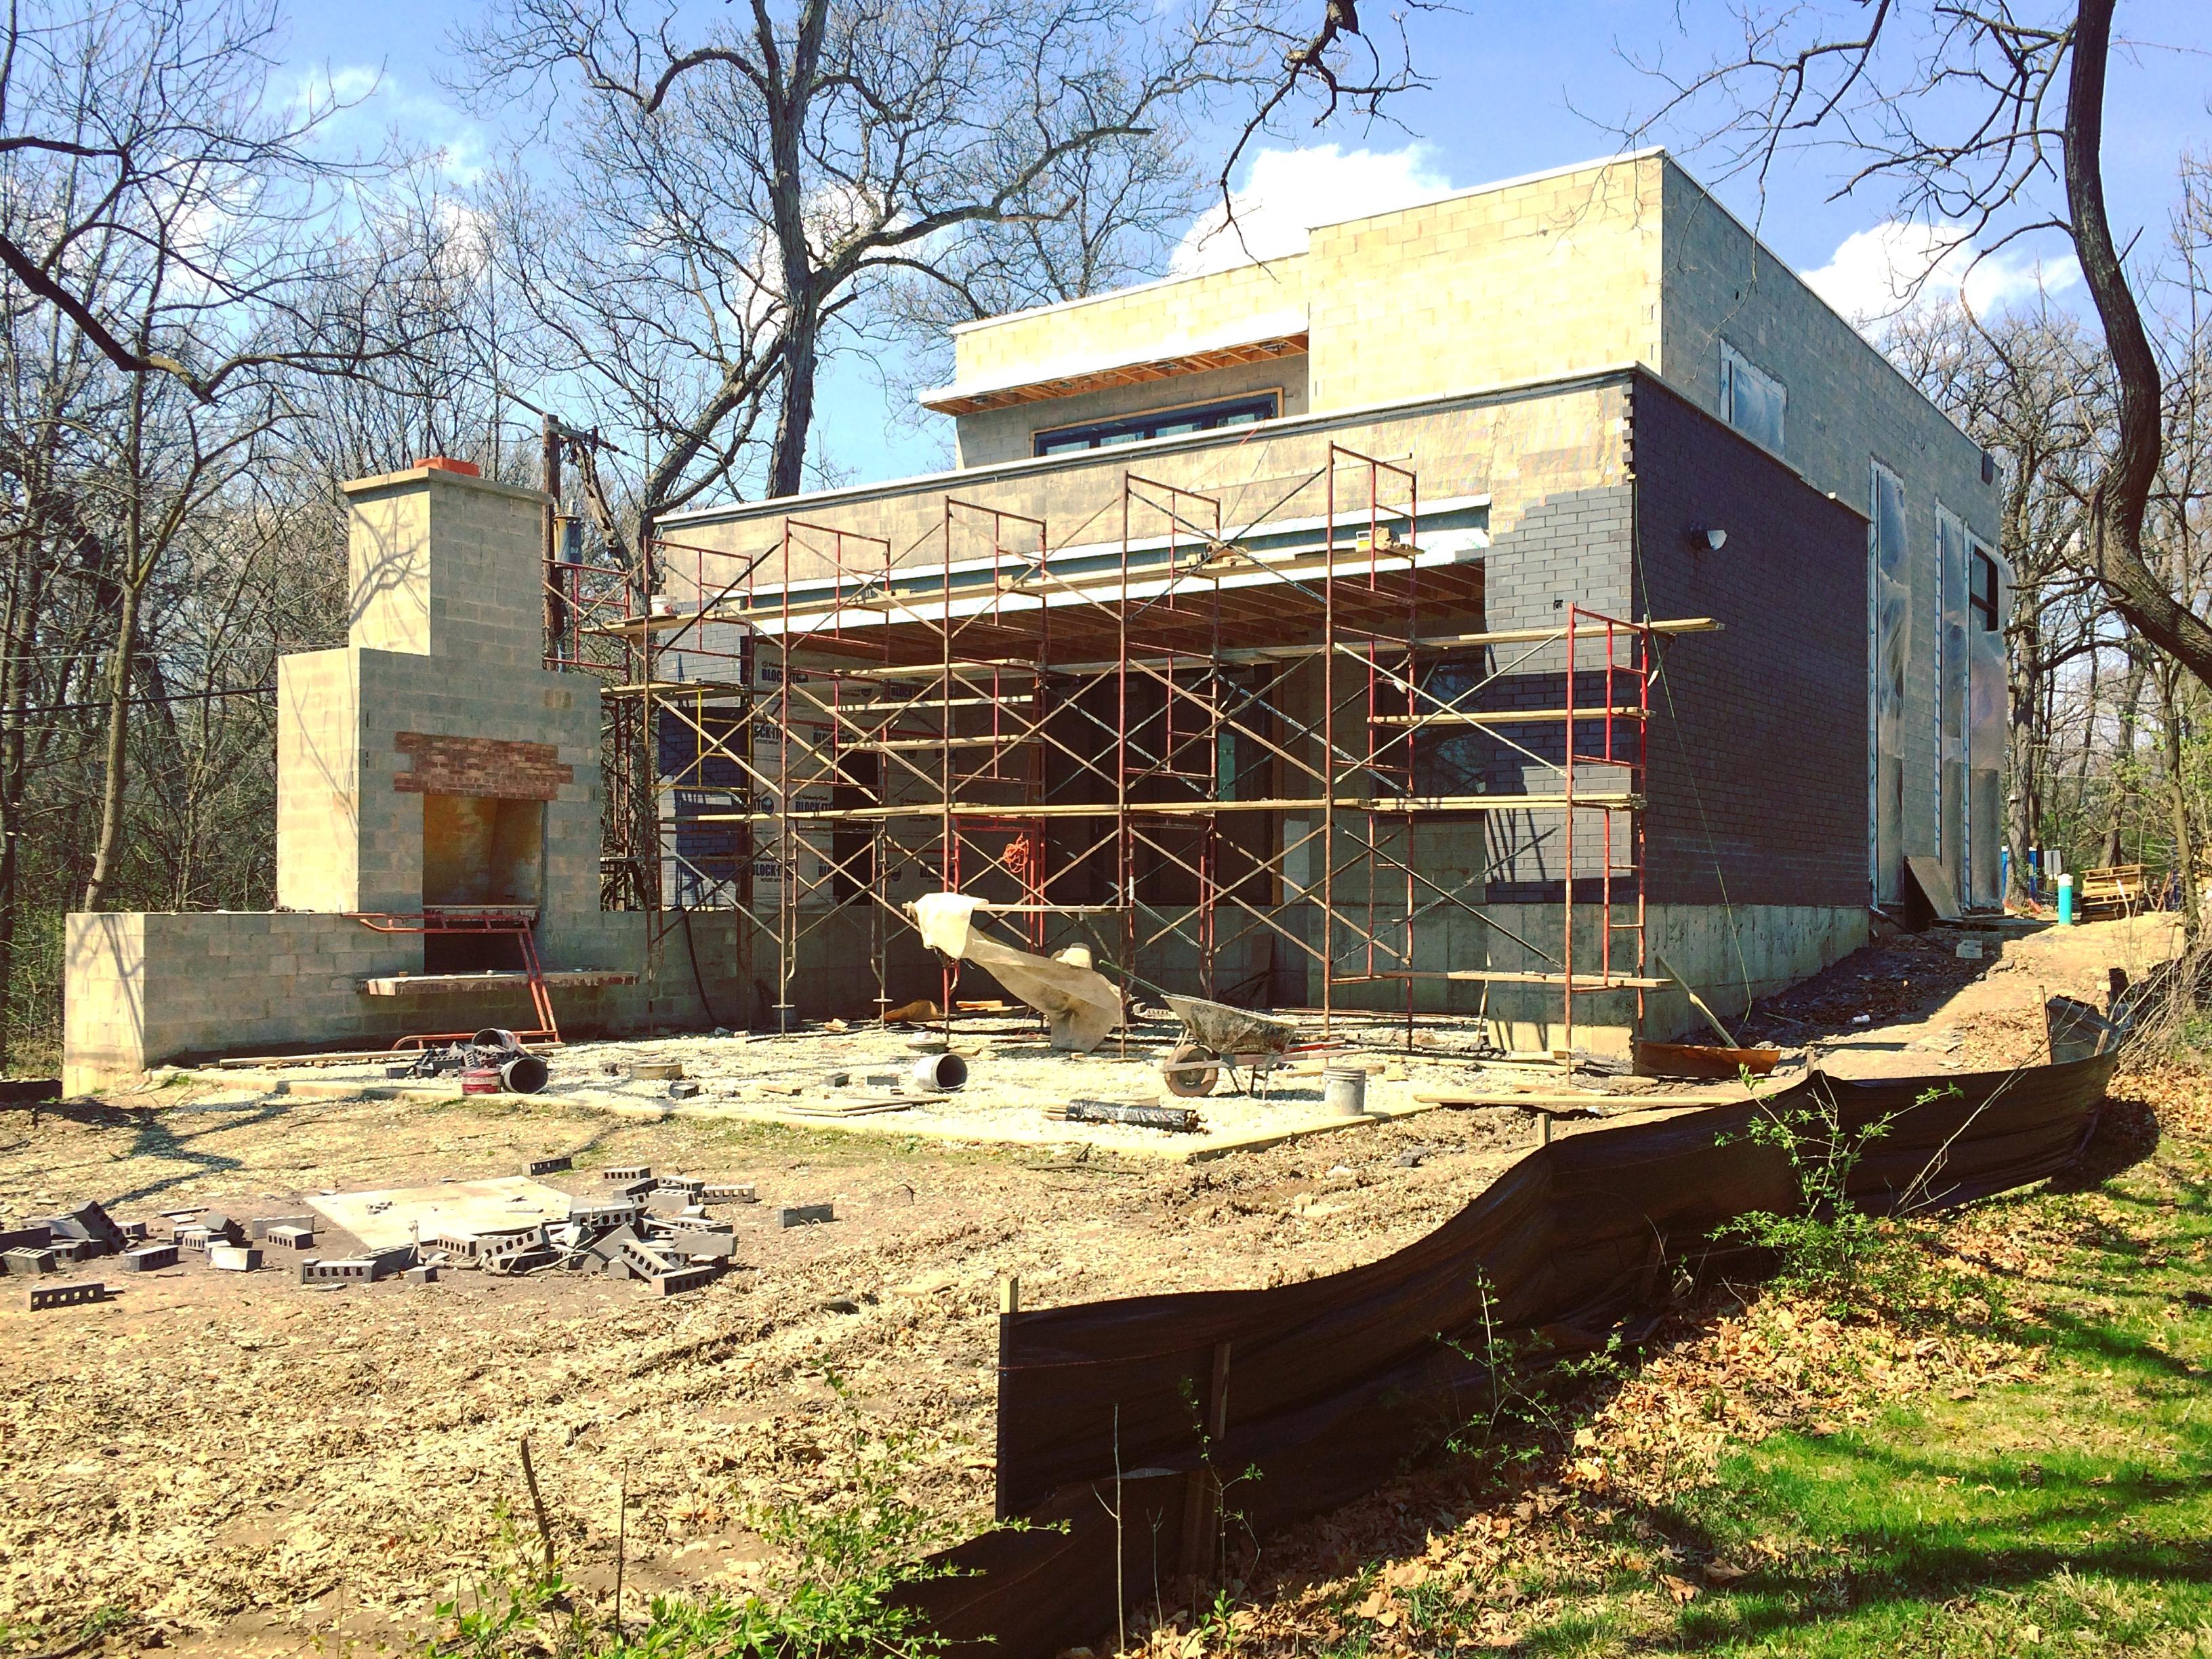 New Modern House 3 - Back Elevation Construction Progress